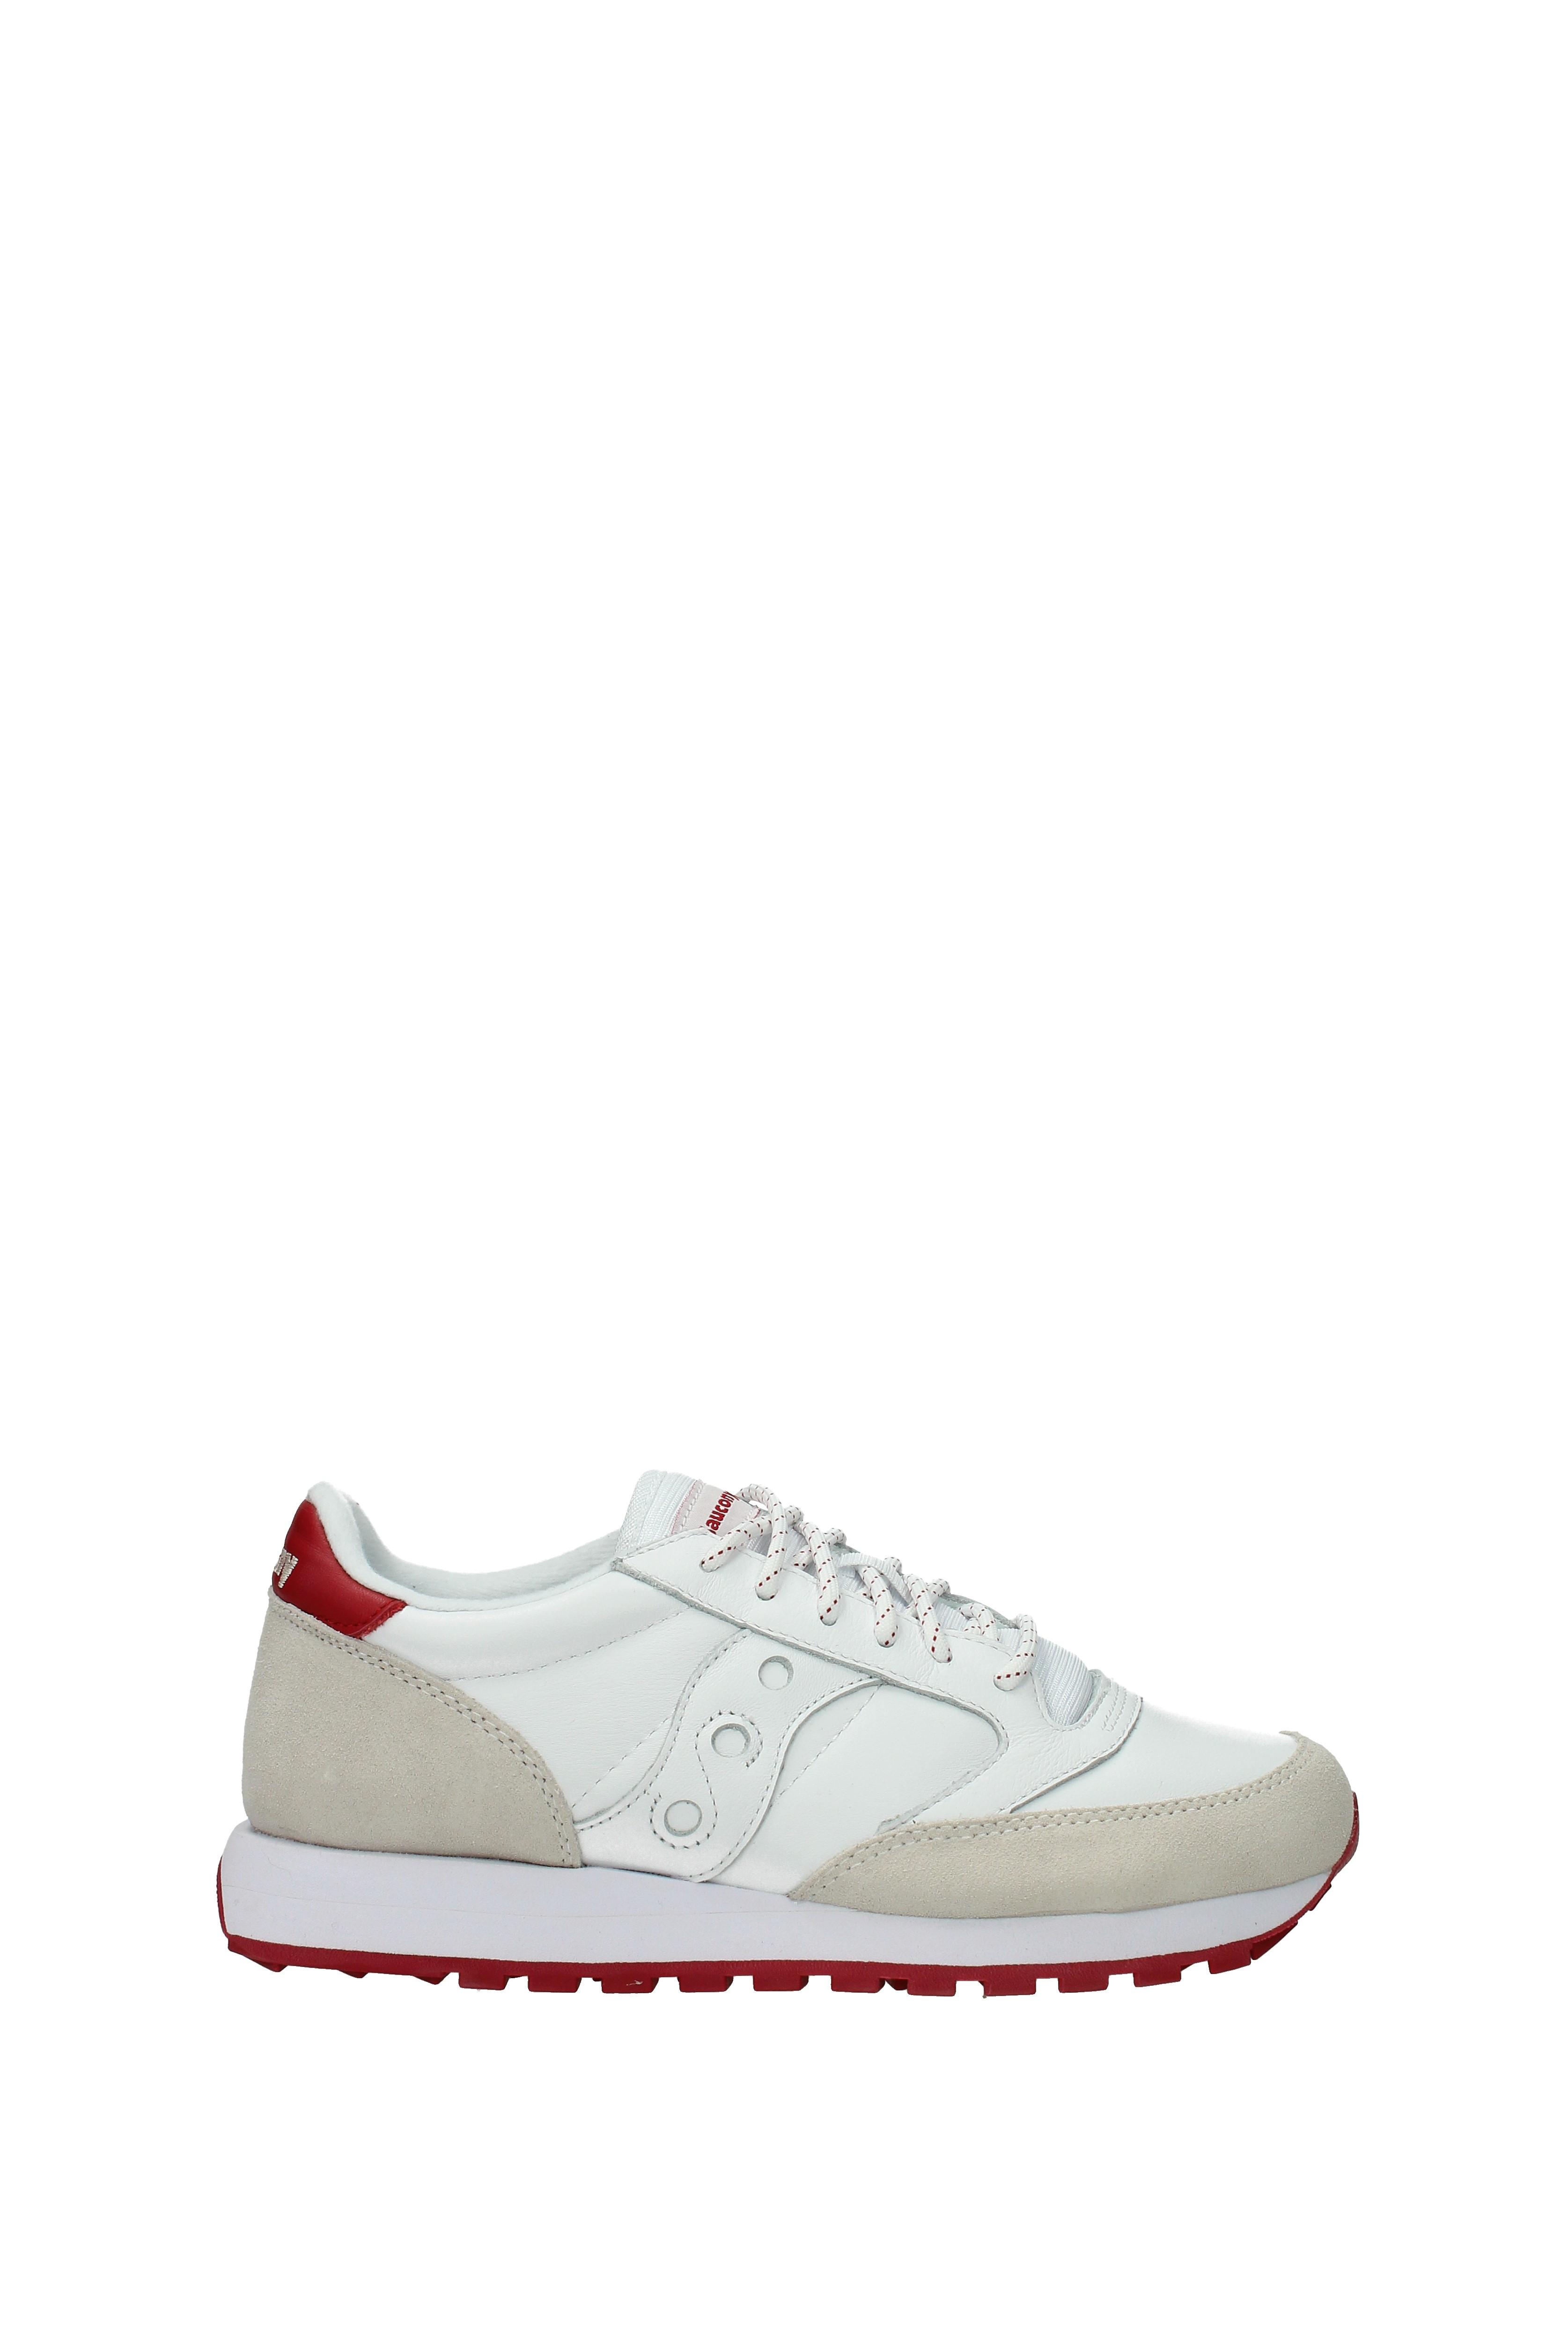 Sneakers Saucony jazz original Uomo Pelle S70325